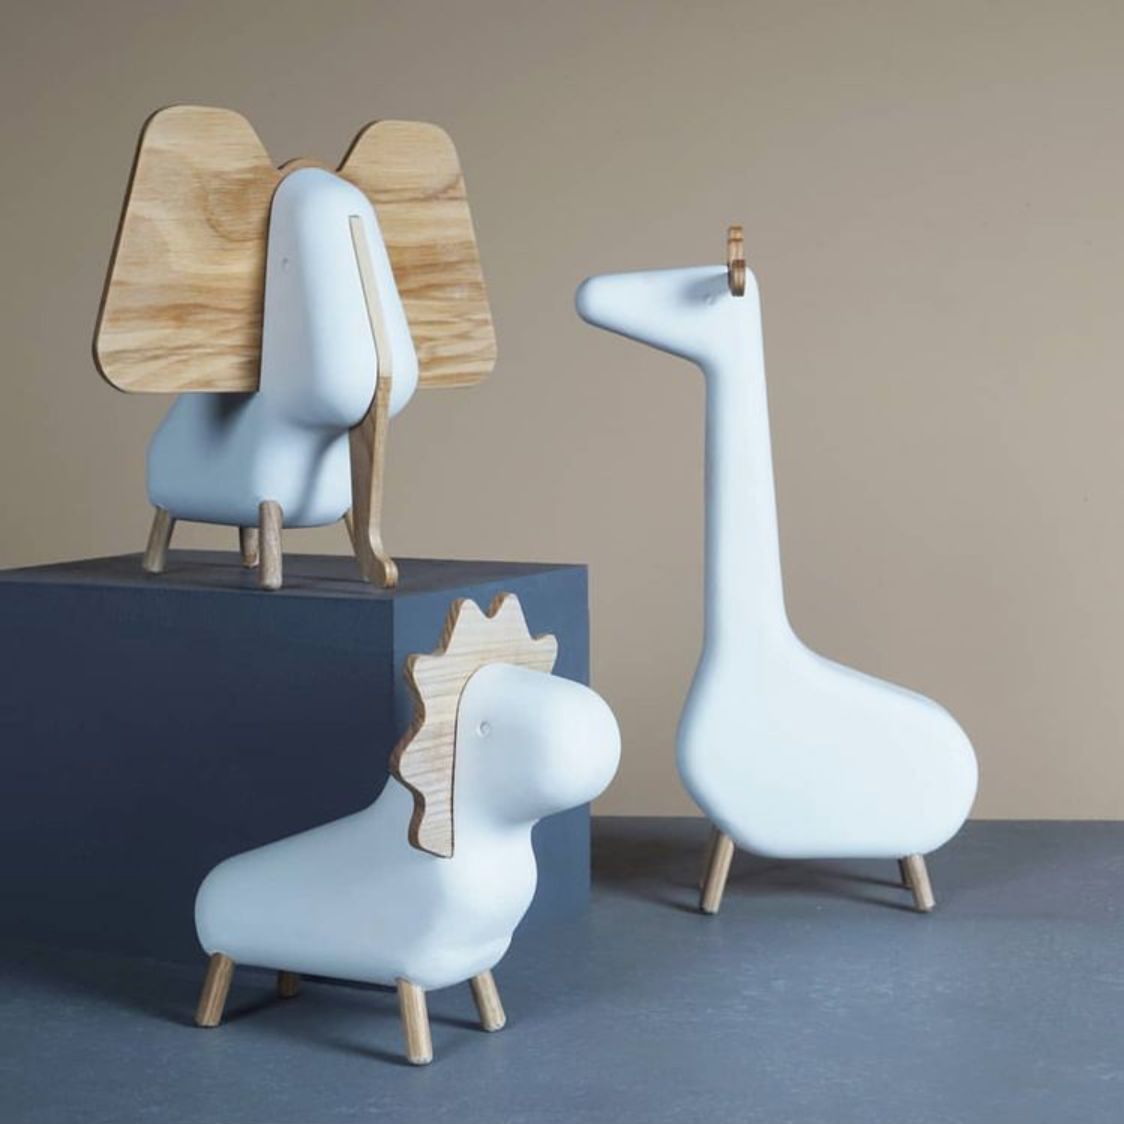 Creative Nordic Style Desktop Resin Animal Figurines Lion Giraffe Elephant Window Display Props Child Room Decor Accessories